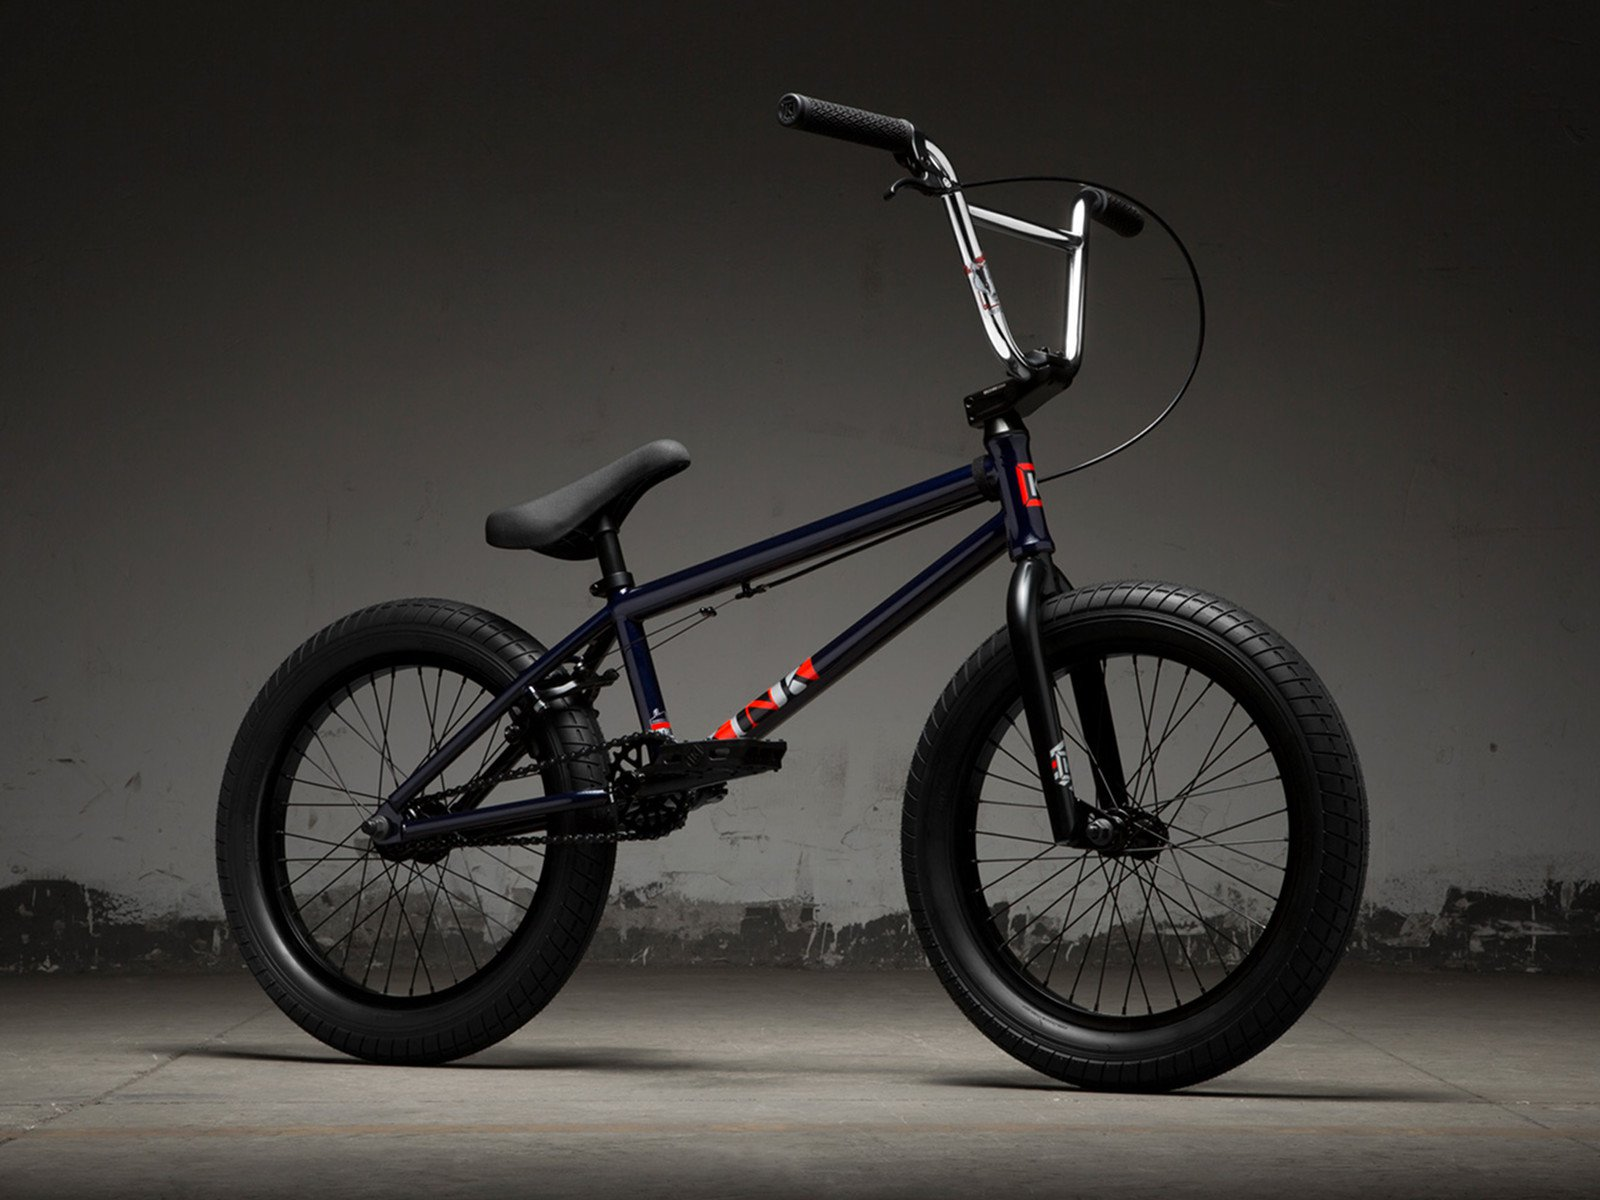 kink bikes kicker 18 2019 bmx rad gloss midnight blue. Black Bedroom Furniture Sets. Home Design Ideas